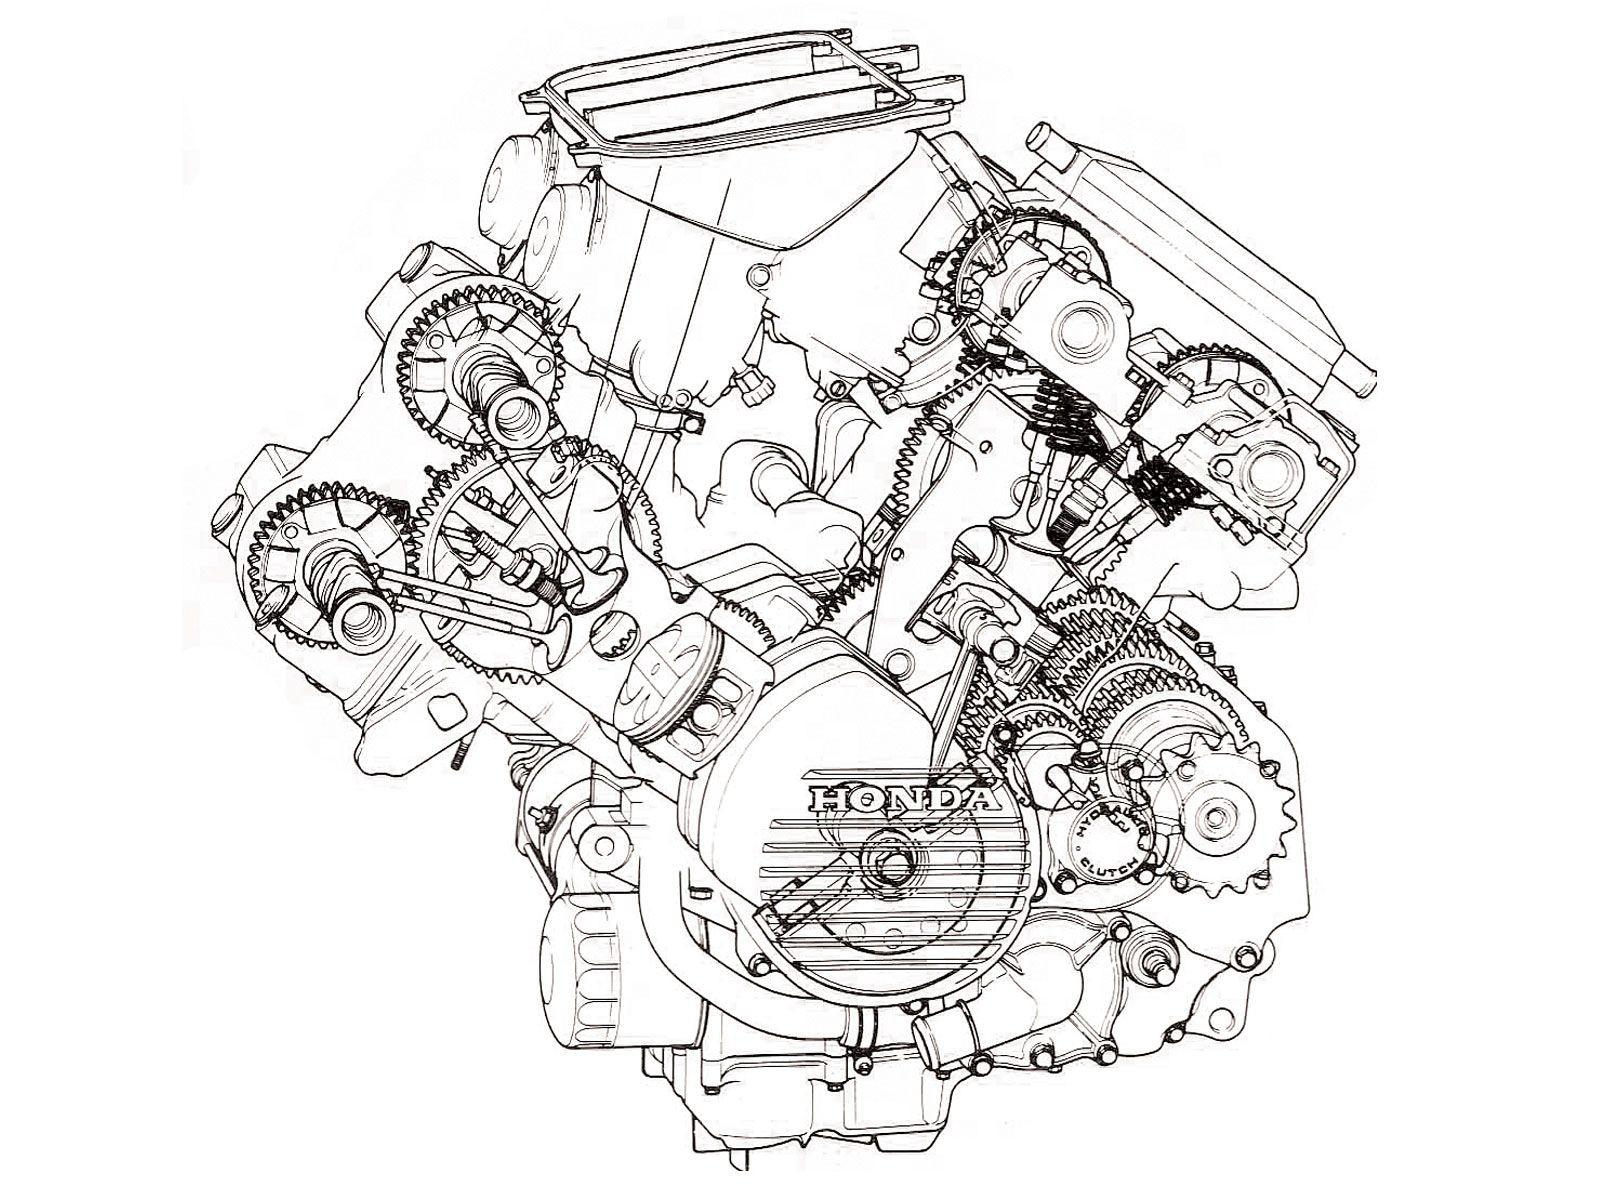 V4 Engine Diagram 1986 Honda Vfr750fg Interceptor V4 Motor Shot Geared Cams Of V4 Engine Diagram